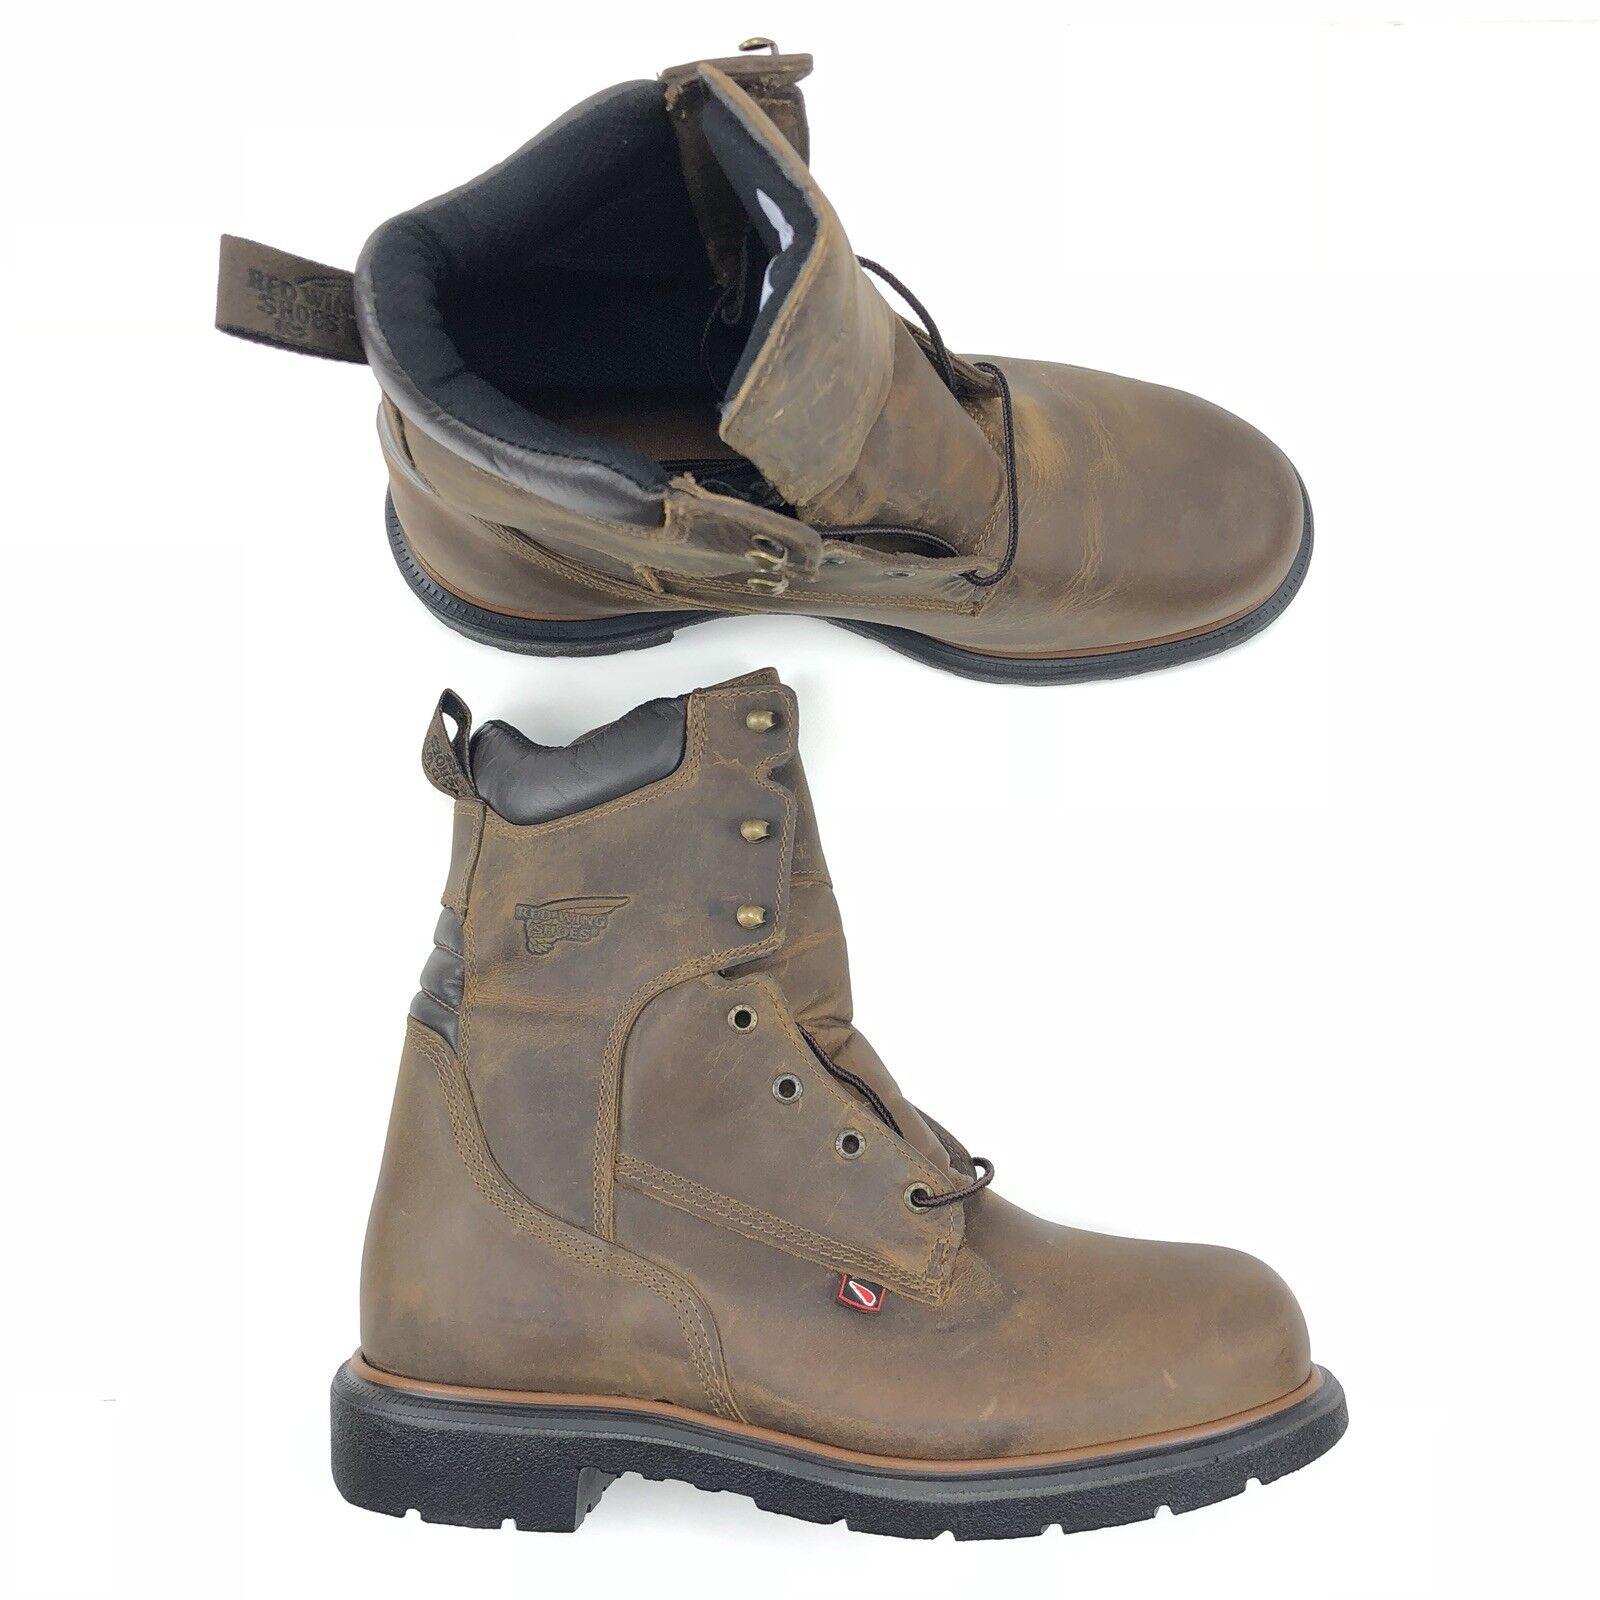 Rosso Wing Men Dynaforce 8 Inch Electrical Hazard Safety avvio Marroneee Leather 903